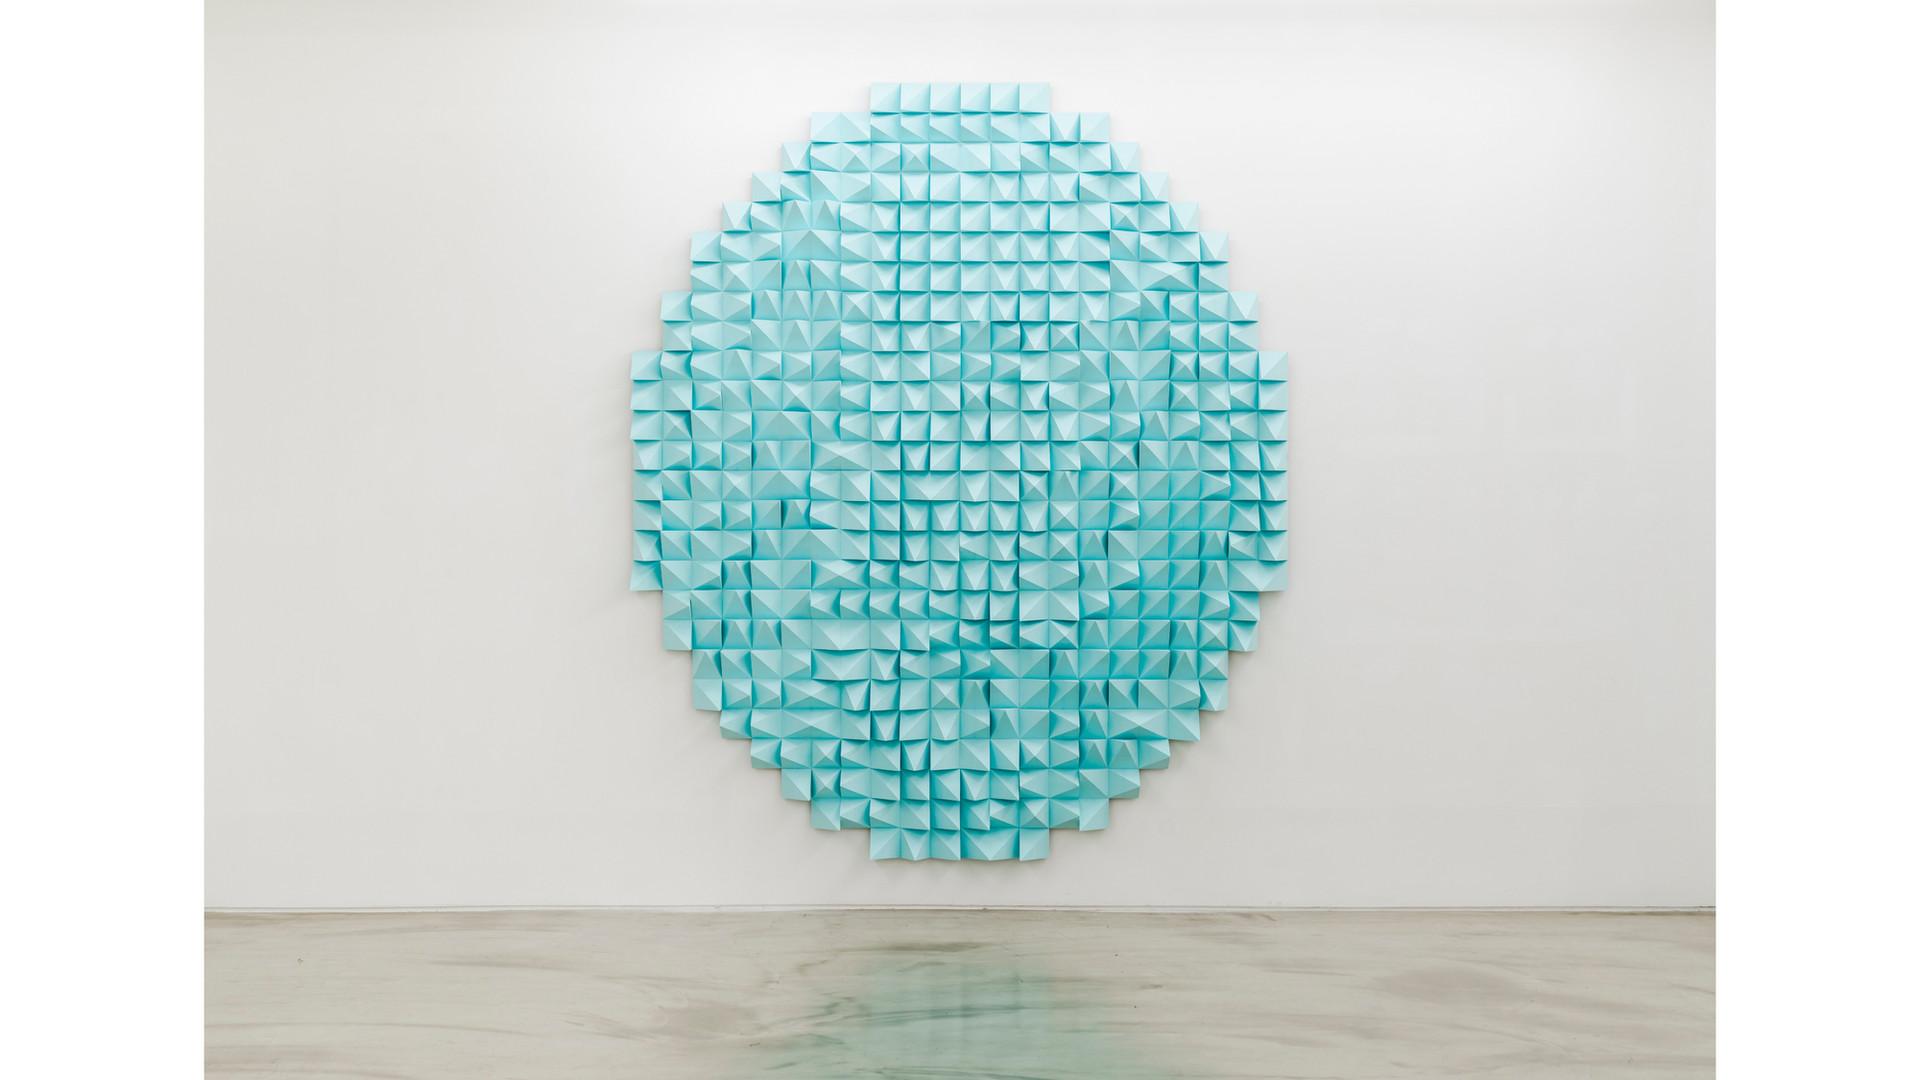 Silent Franklin-II, 2021, EVA foam, 420 x 180 x 10cm